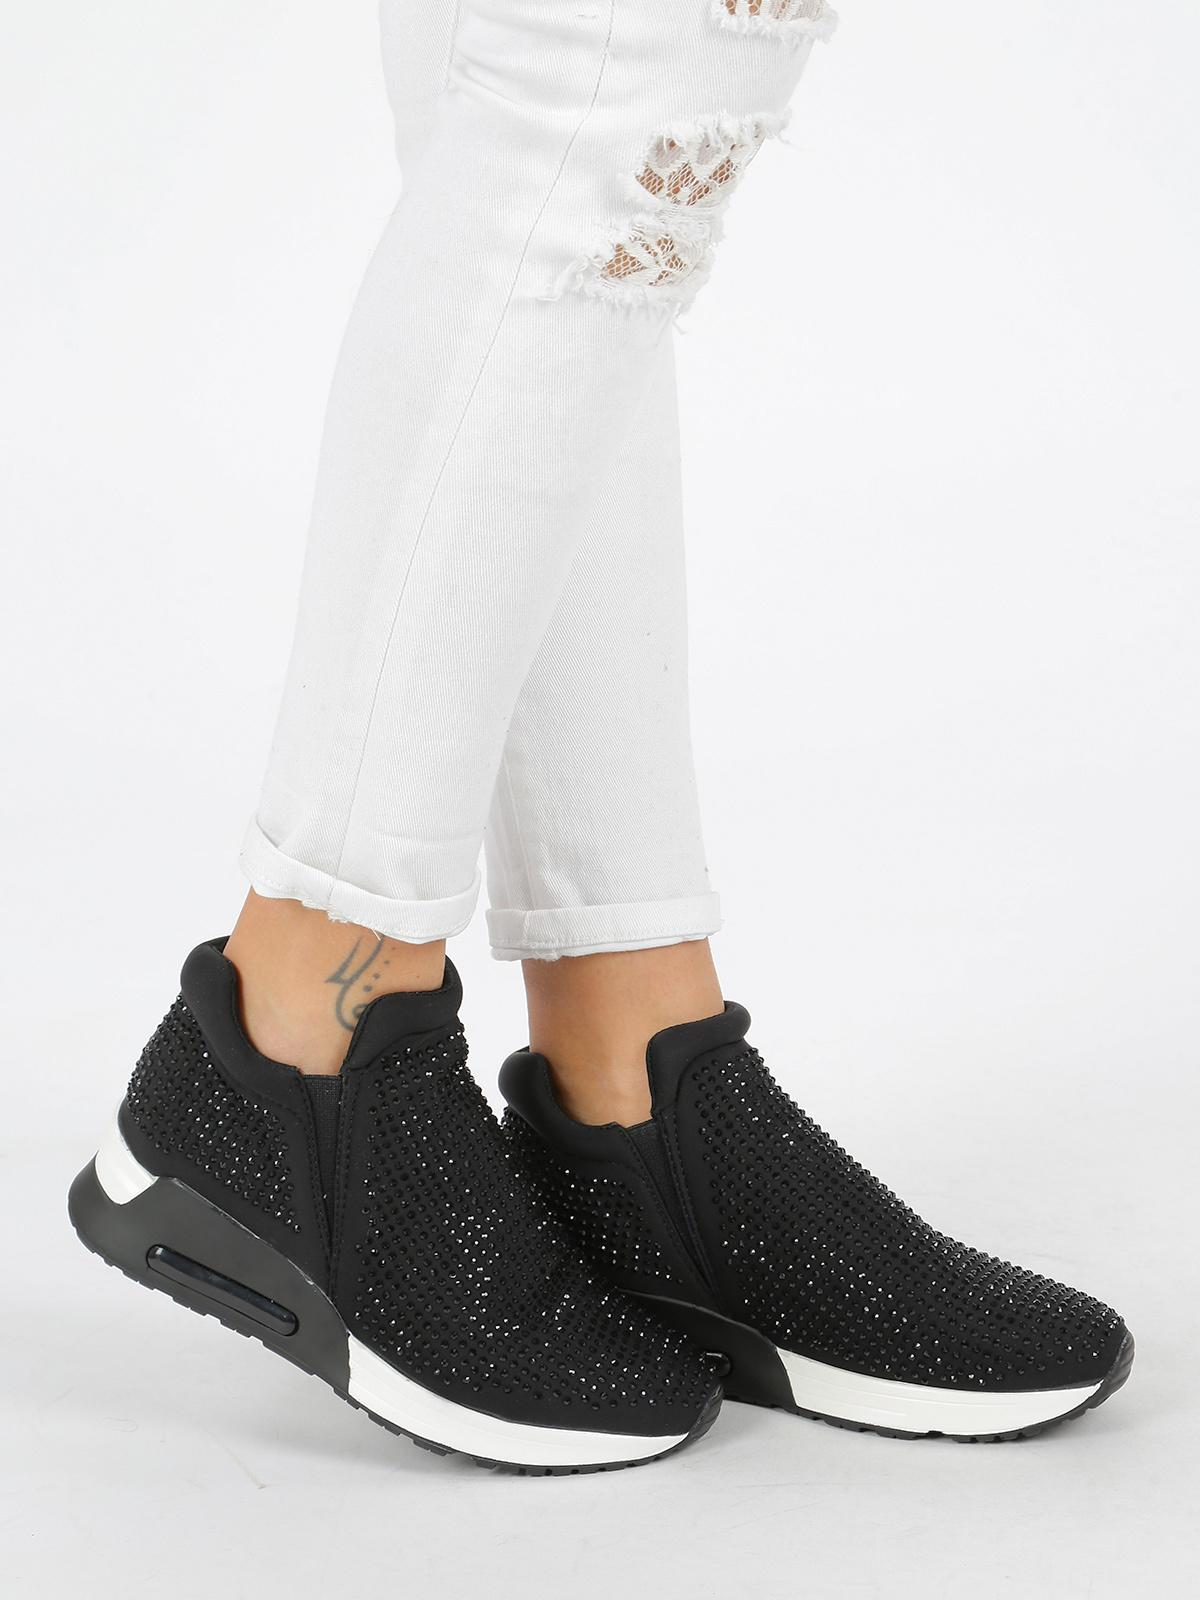 adidas scarpe donna con strass